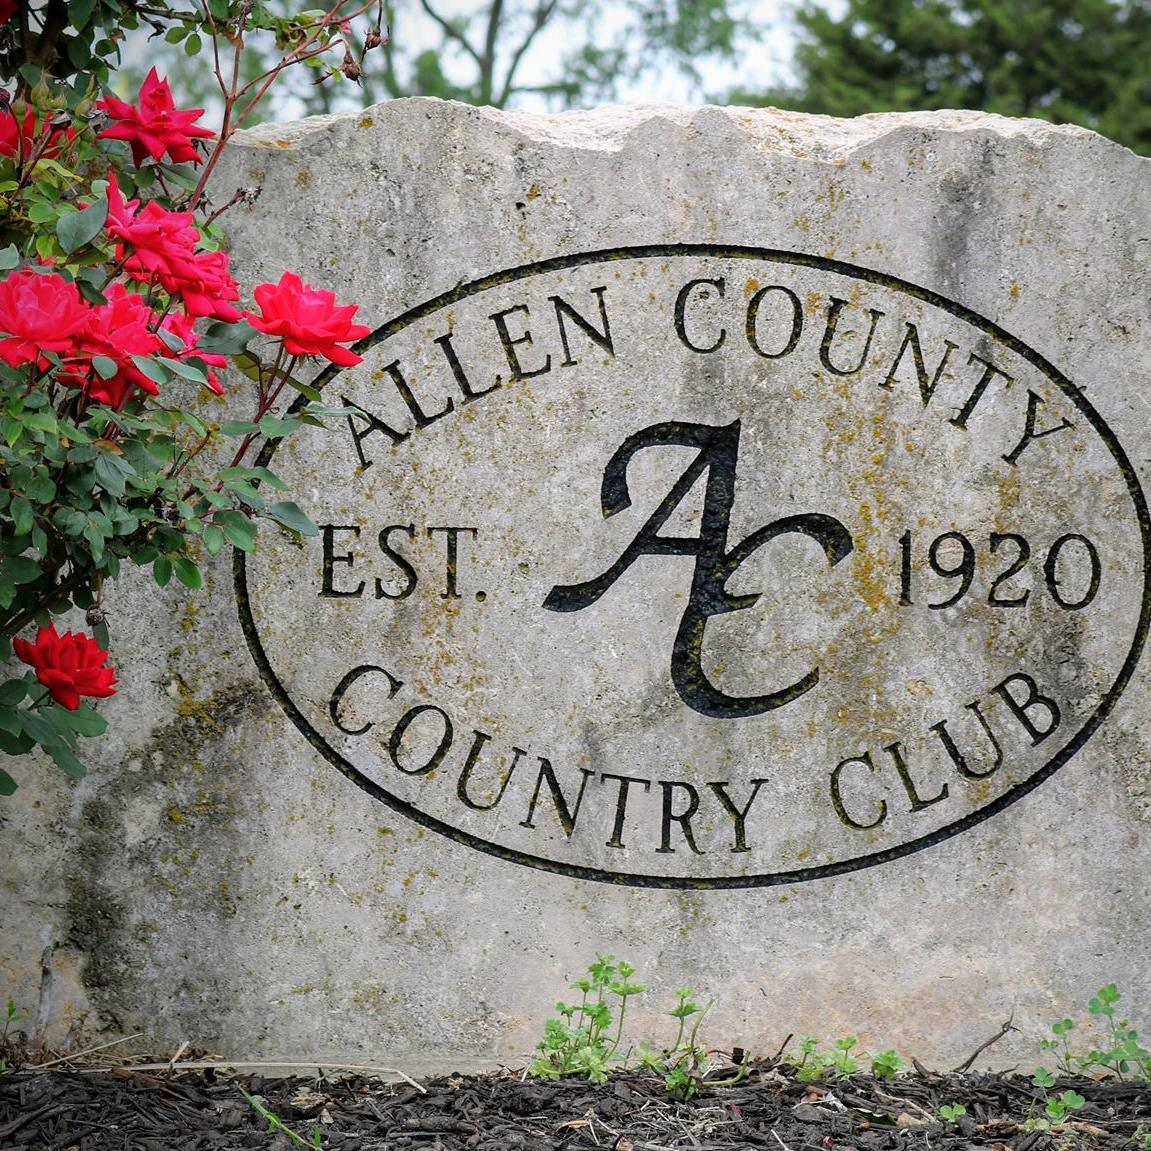 allencountryclub.jpg